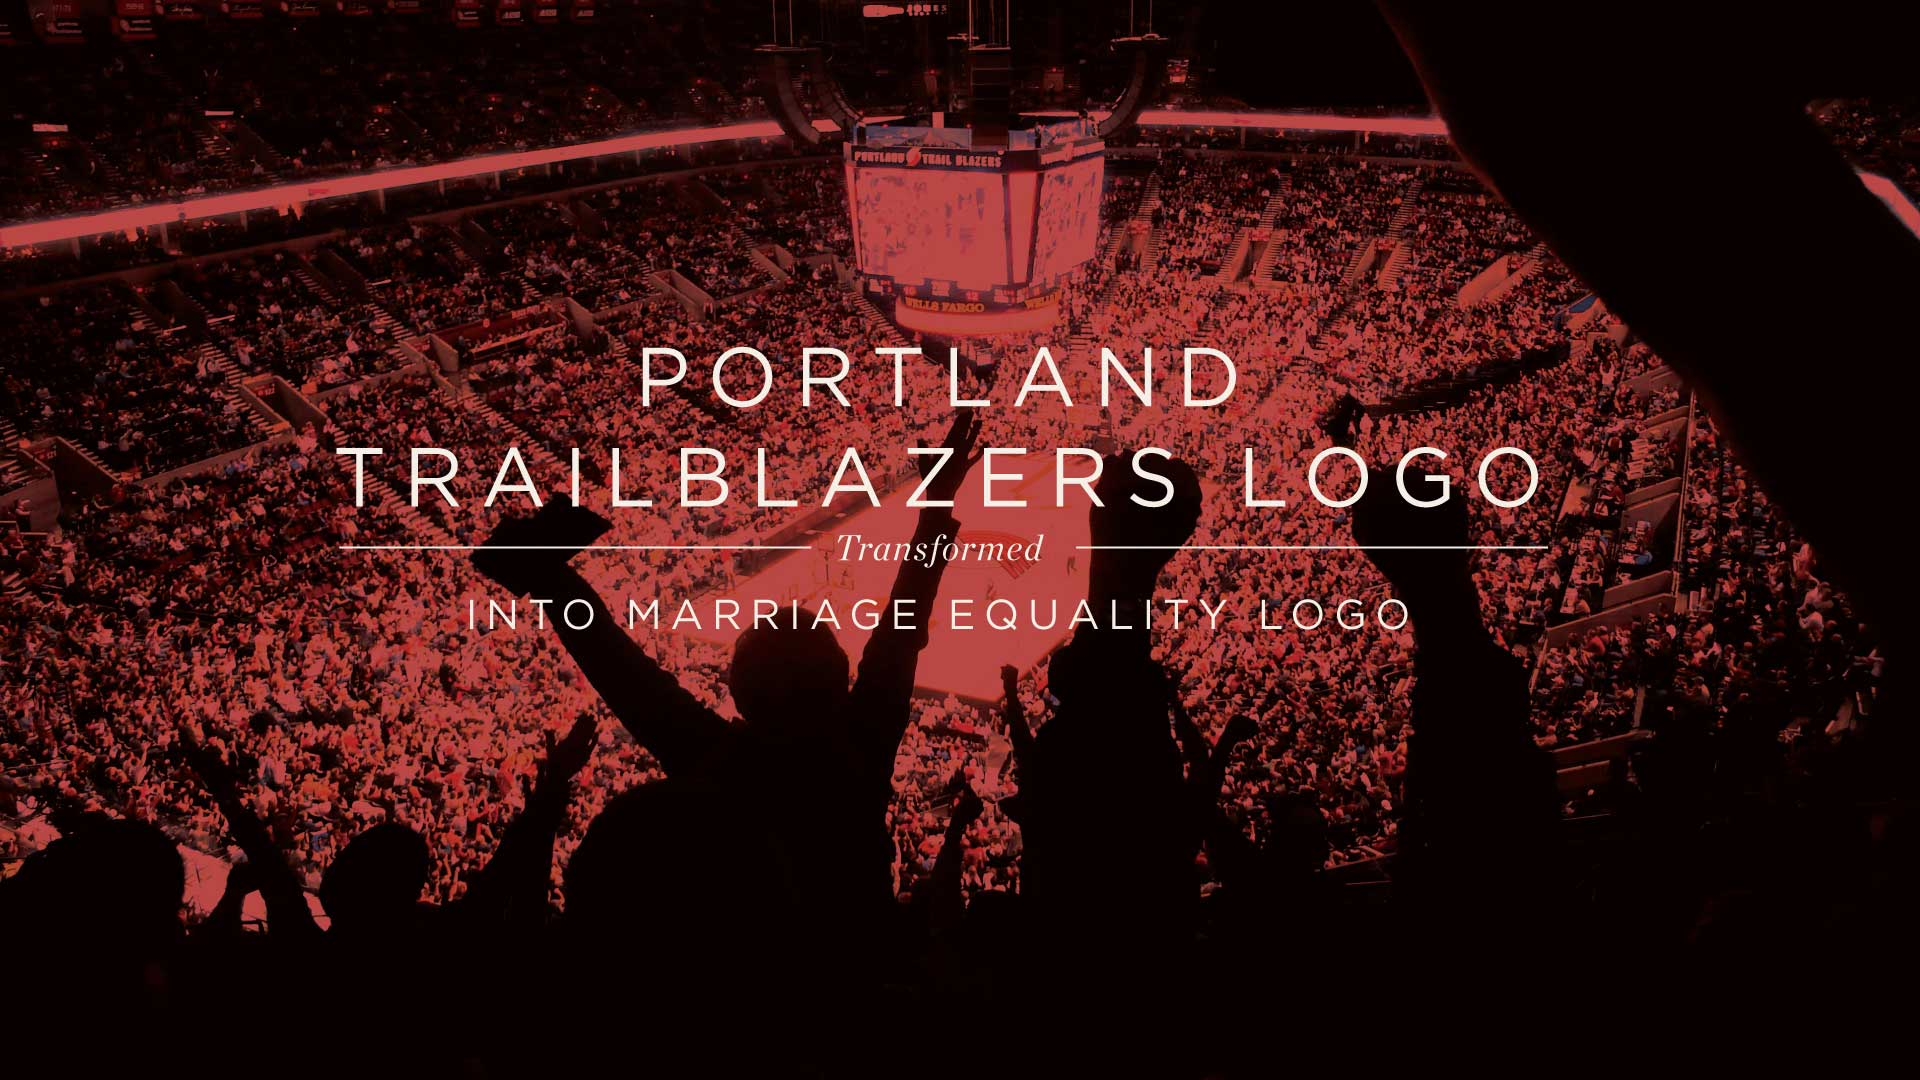 Portland Blazers Logo Transformed into a Marriage Equality Logo 3